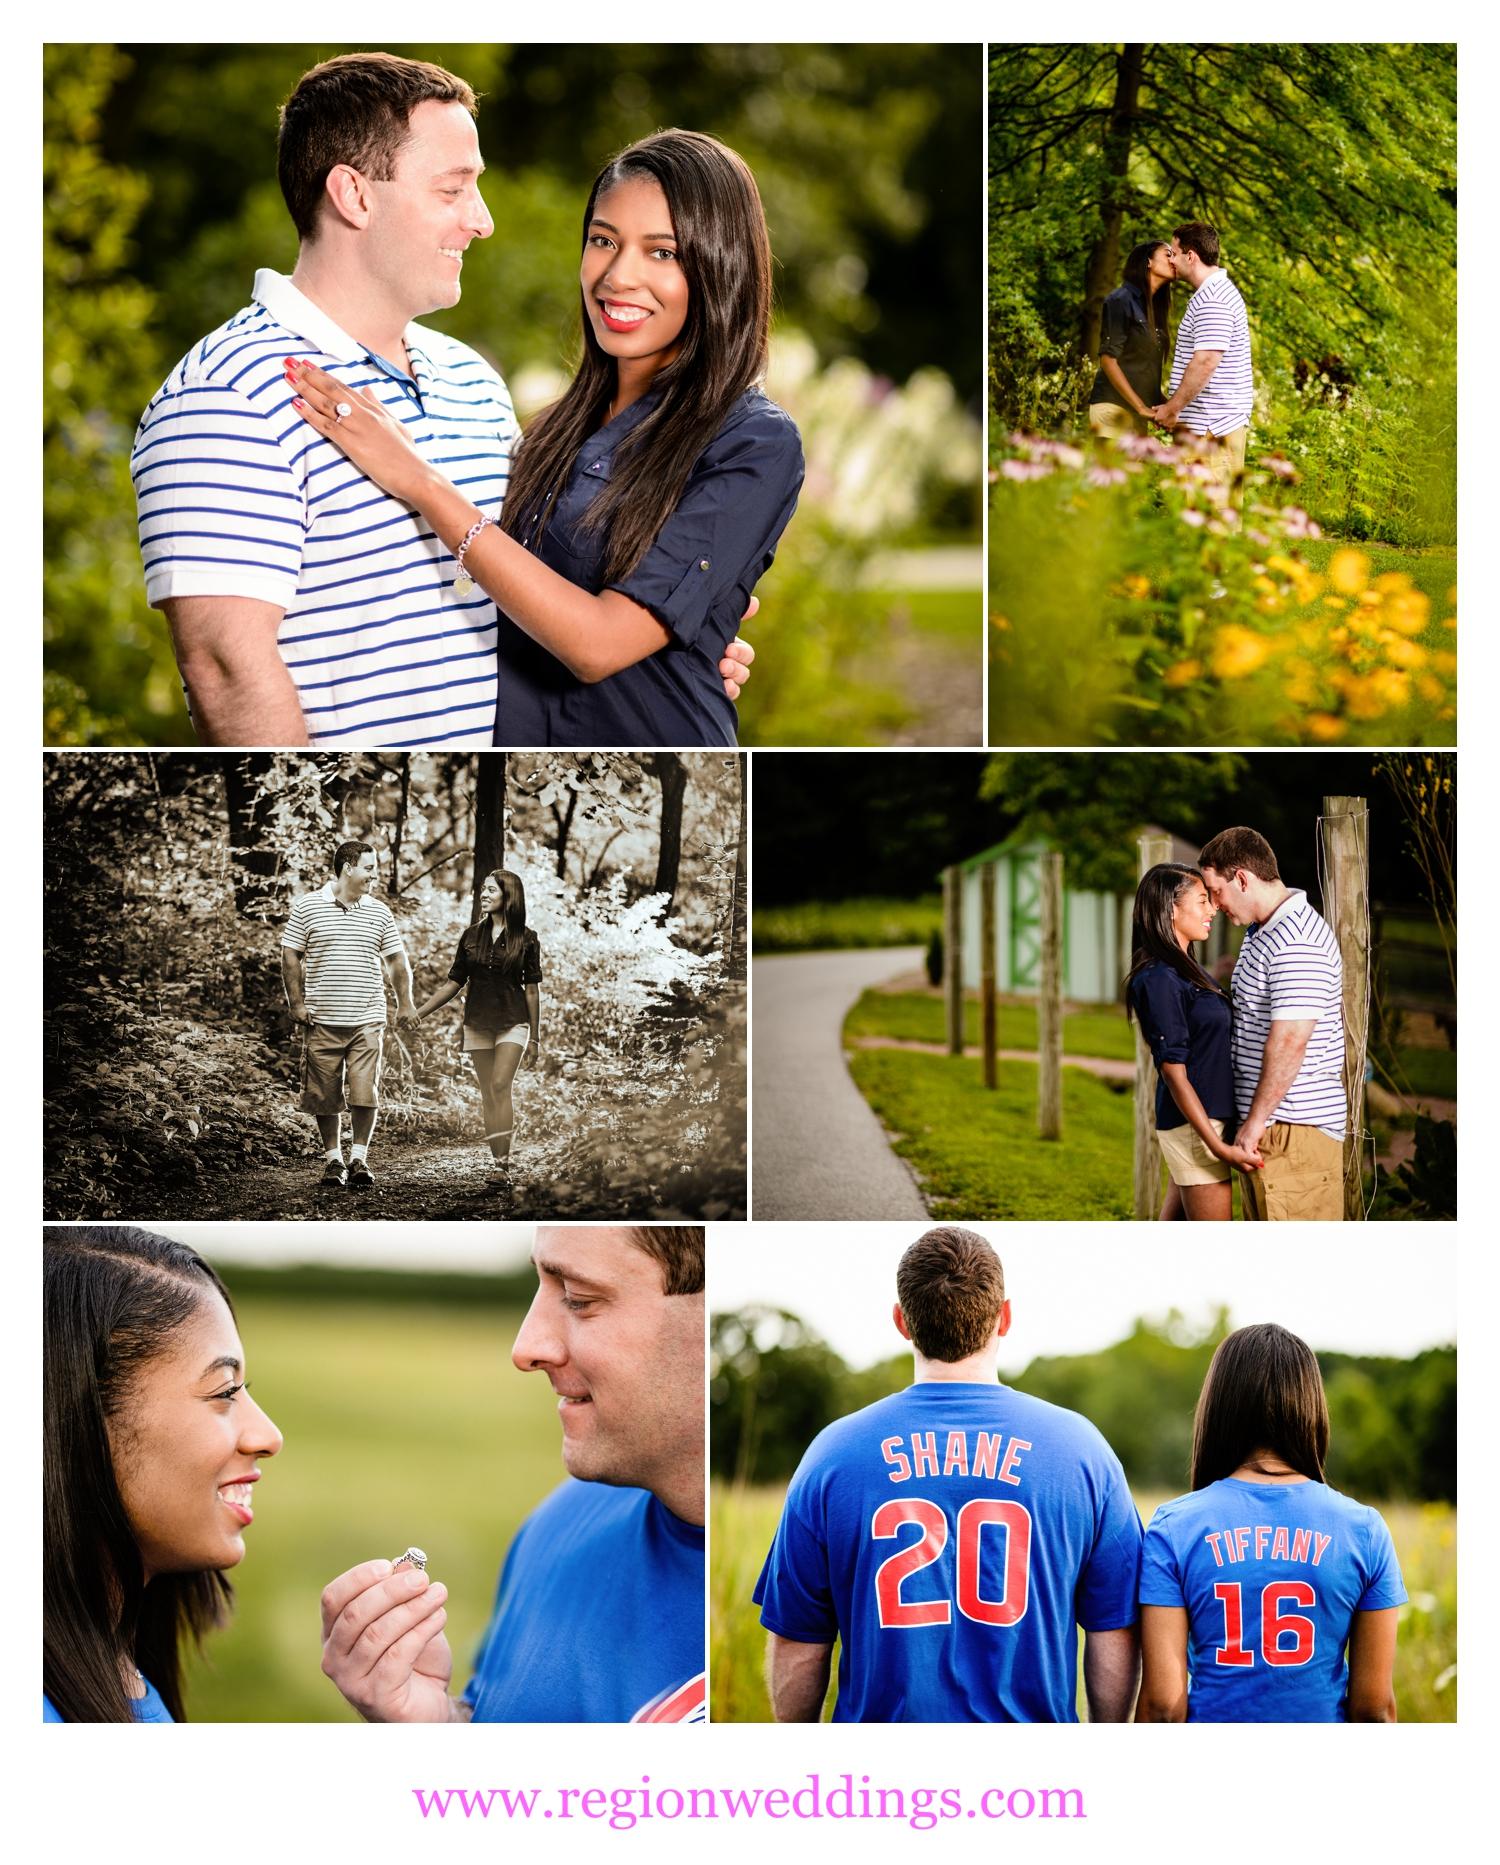 Cute engagement photos at Taltree Arboretum in Valparaiso, Indiana.